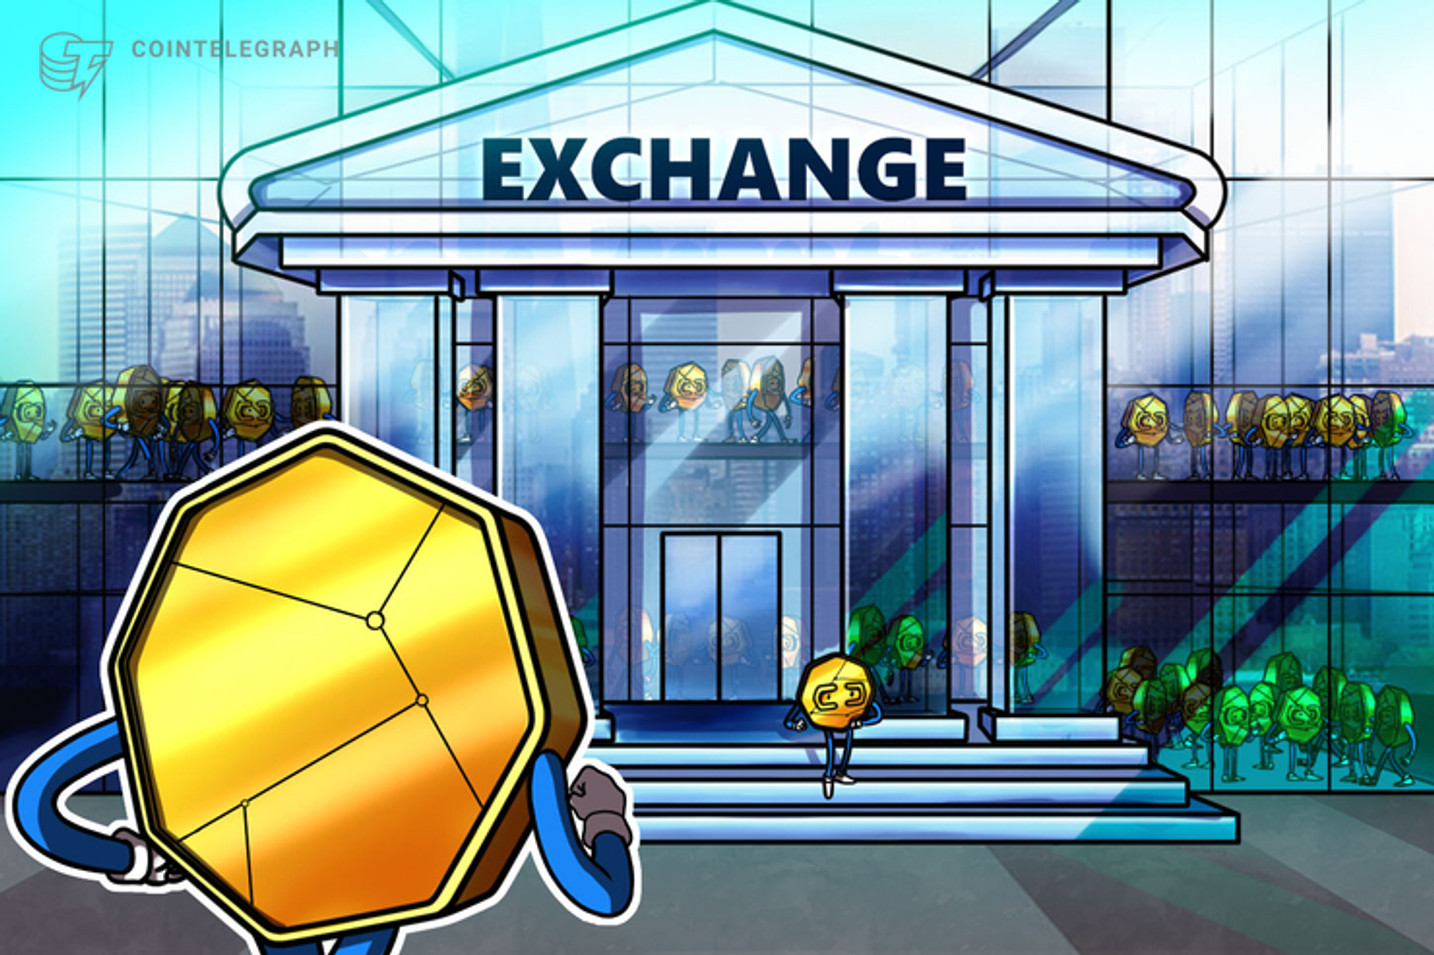 La plataforma de intercambio de criptomonedas Mexo comienza a operar en México